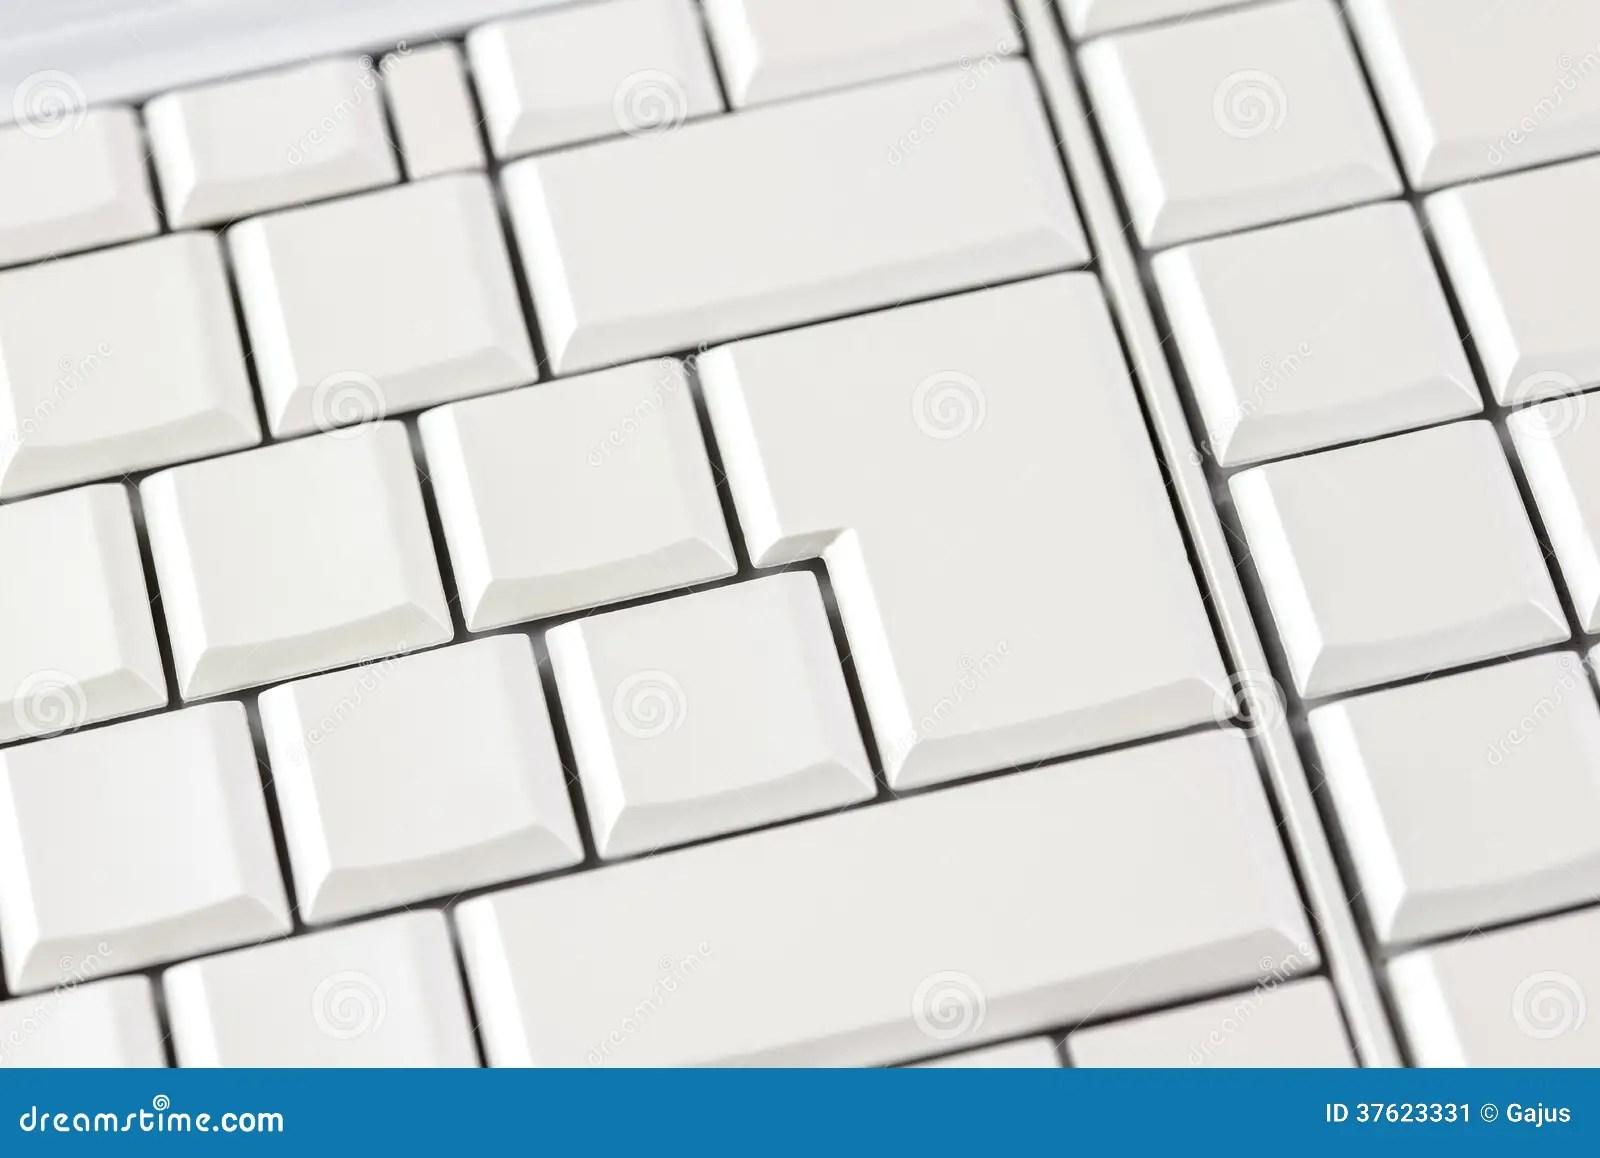 Blank White Keys On A Computer Keyboard Stock Image